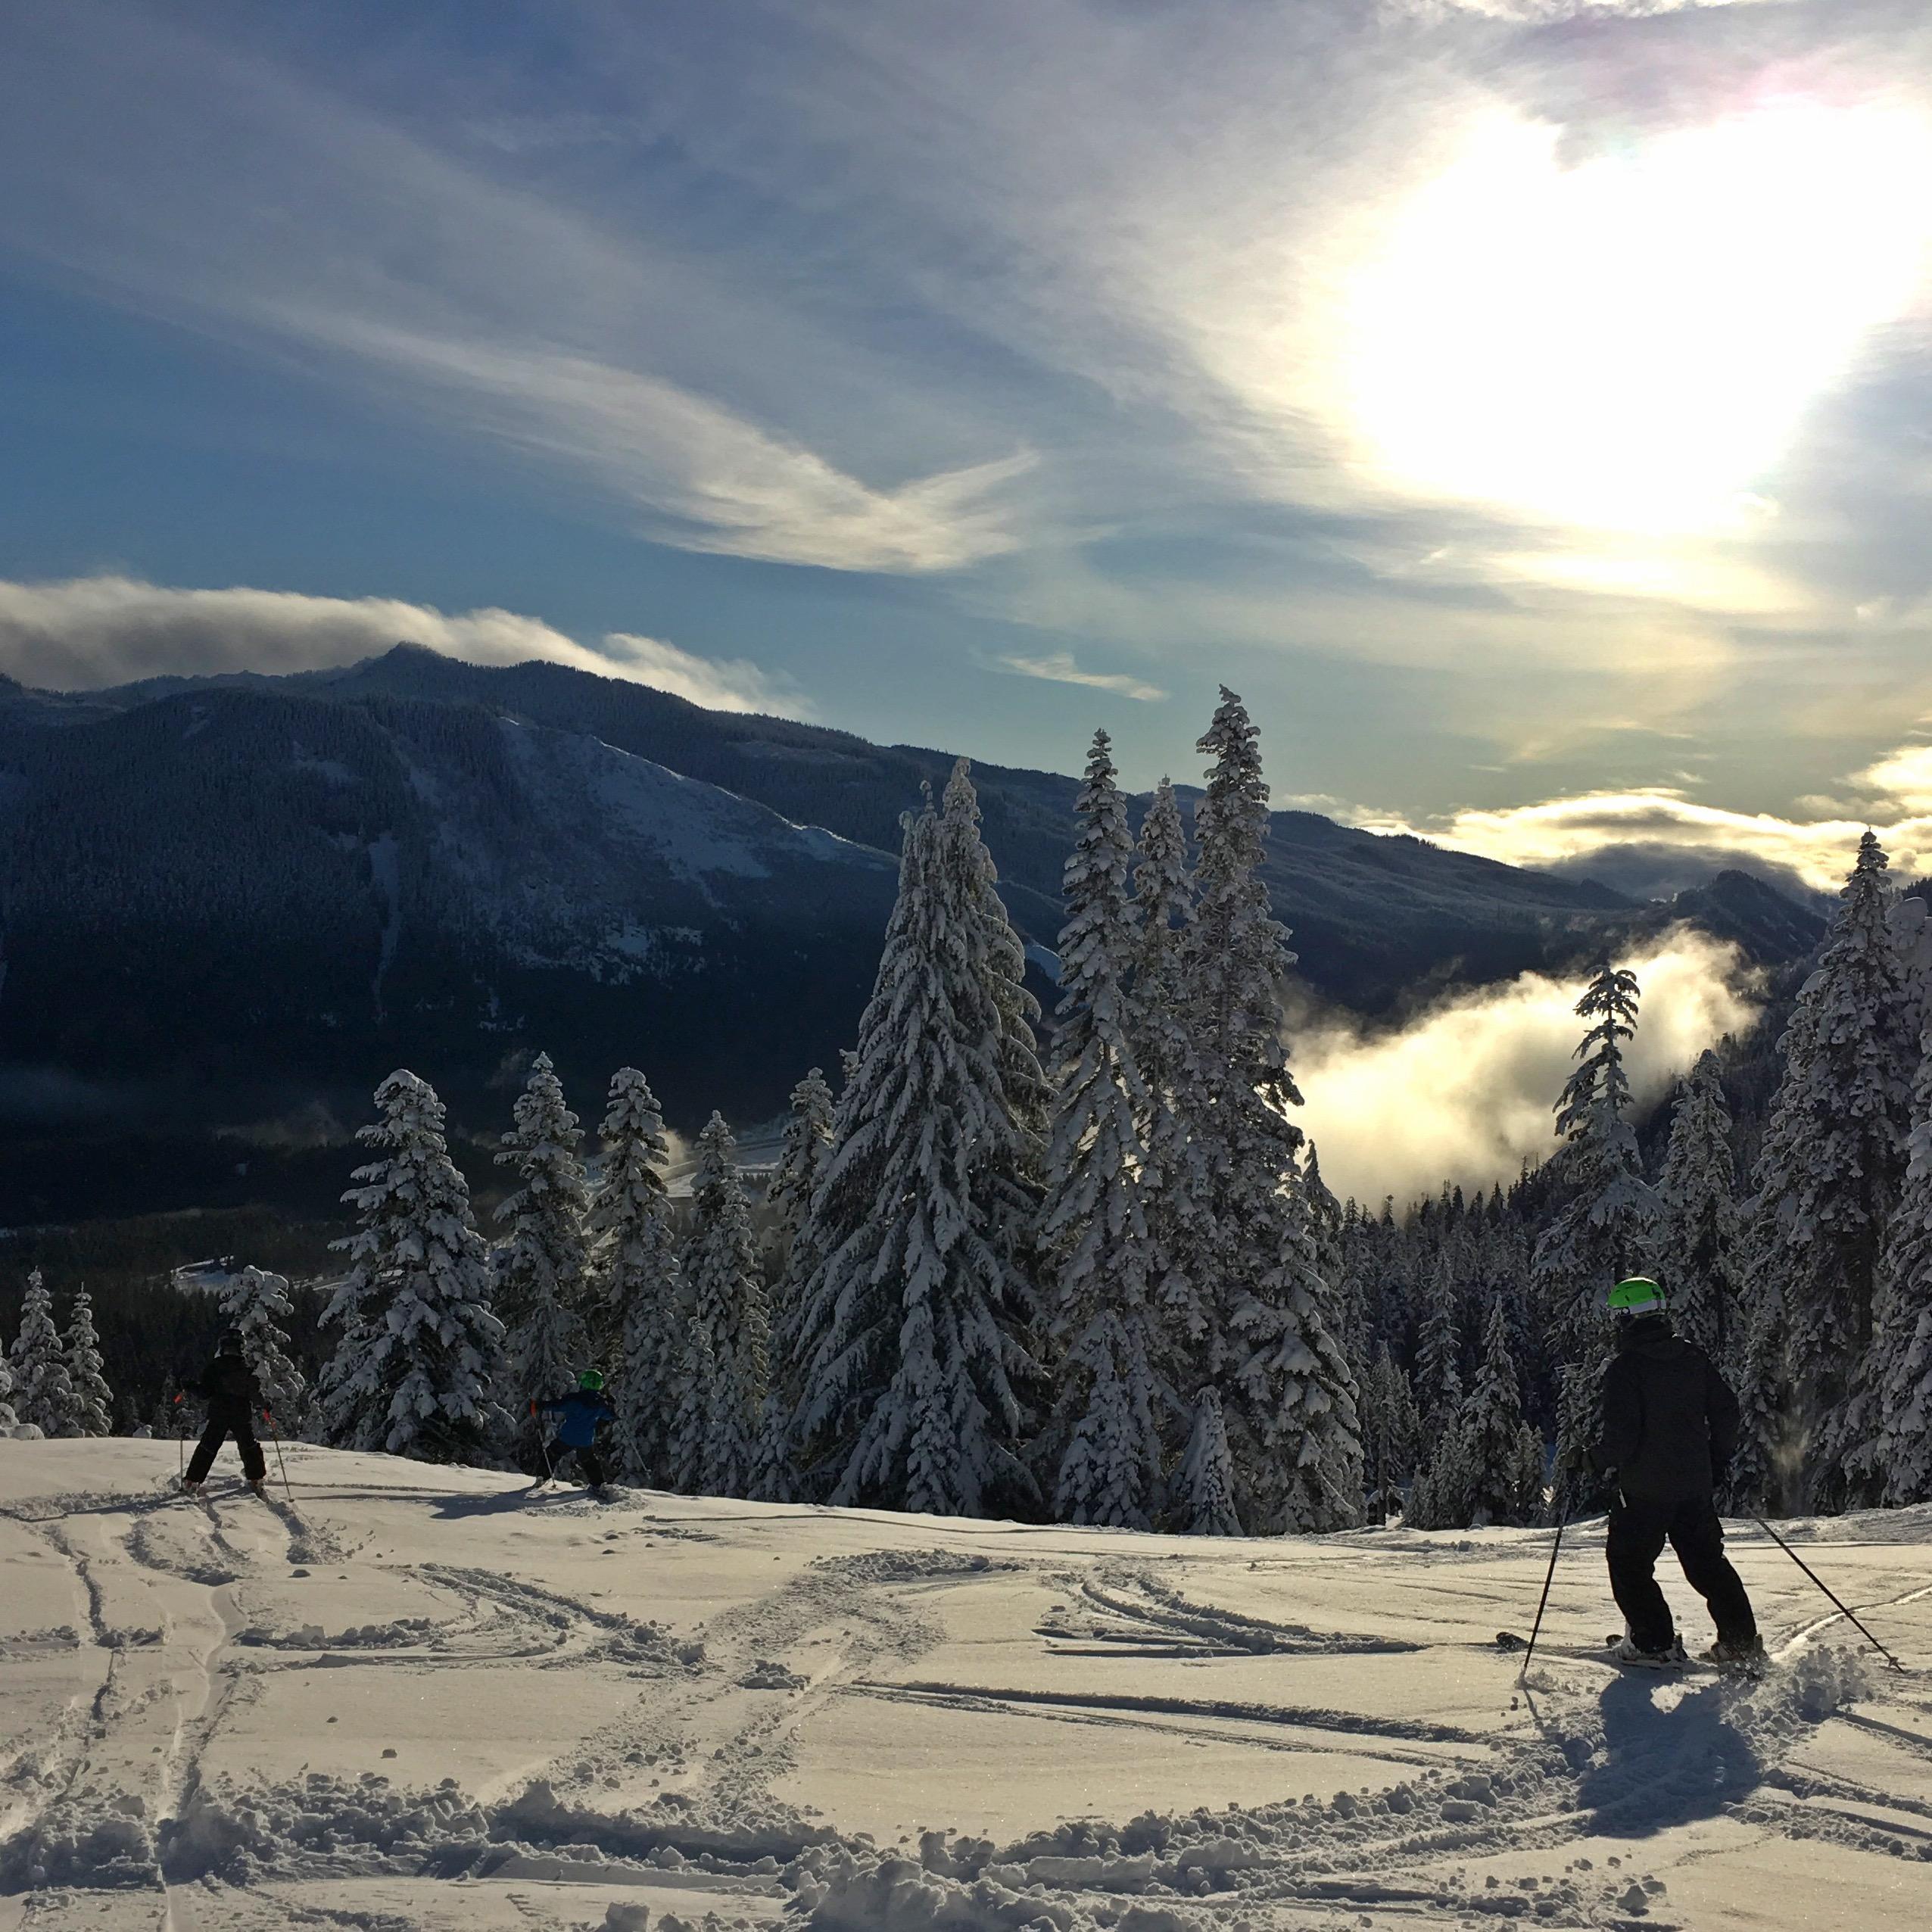 summit at snoqualmie pass